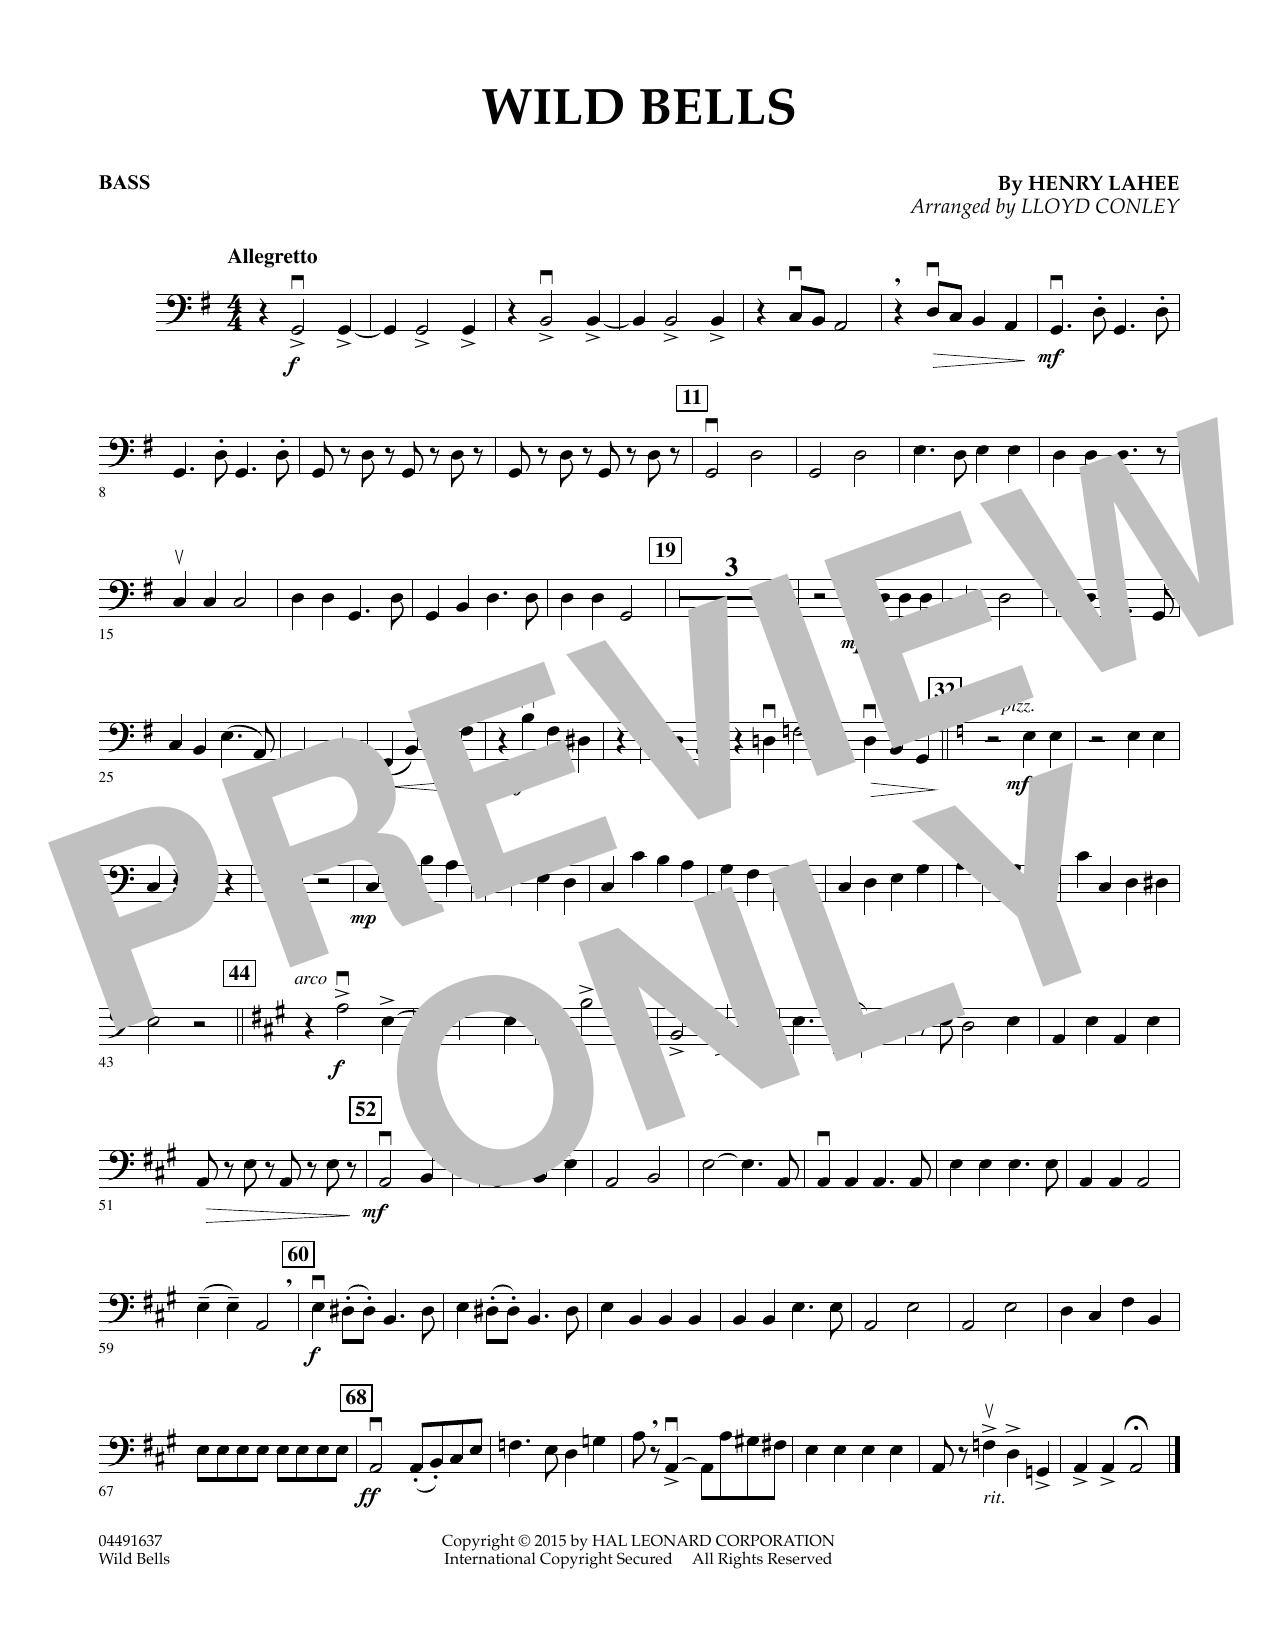 Lloyd Conley Wild Bells - Bass sheet music notes and chords